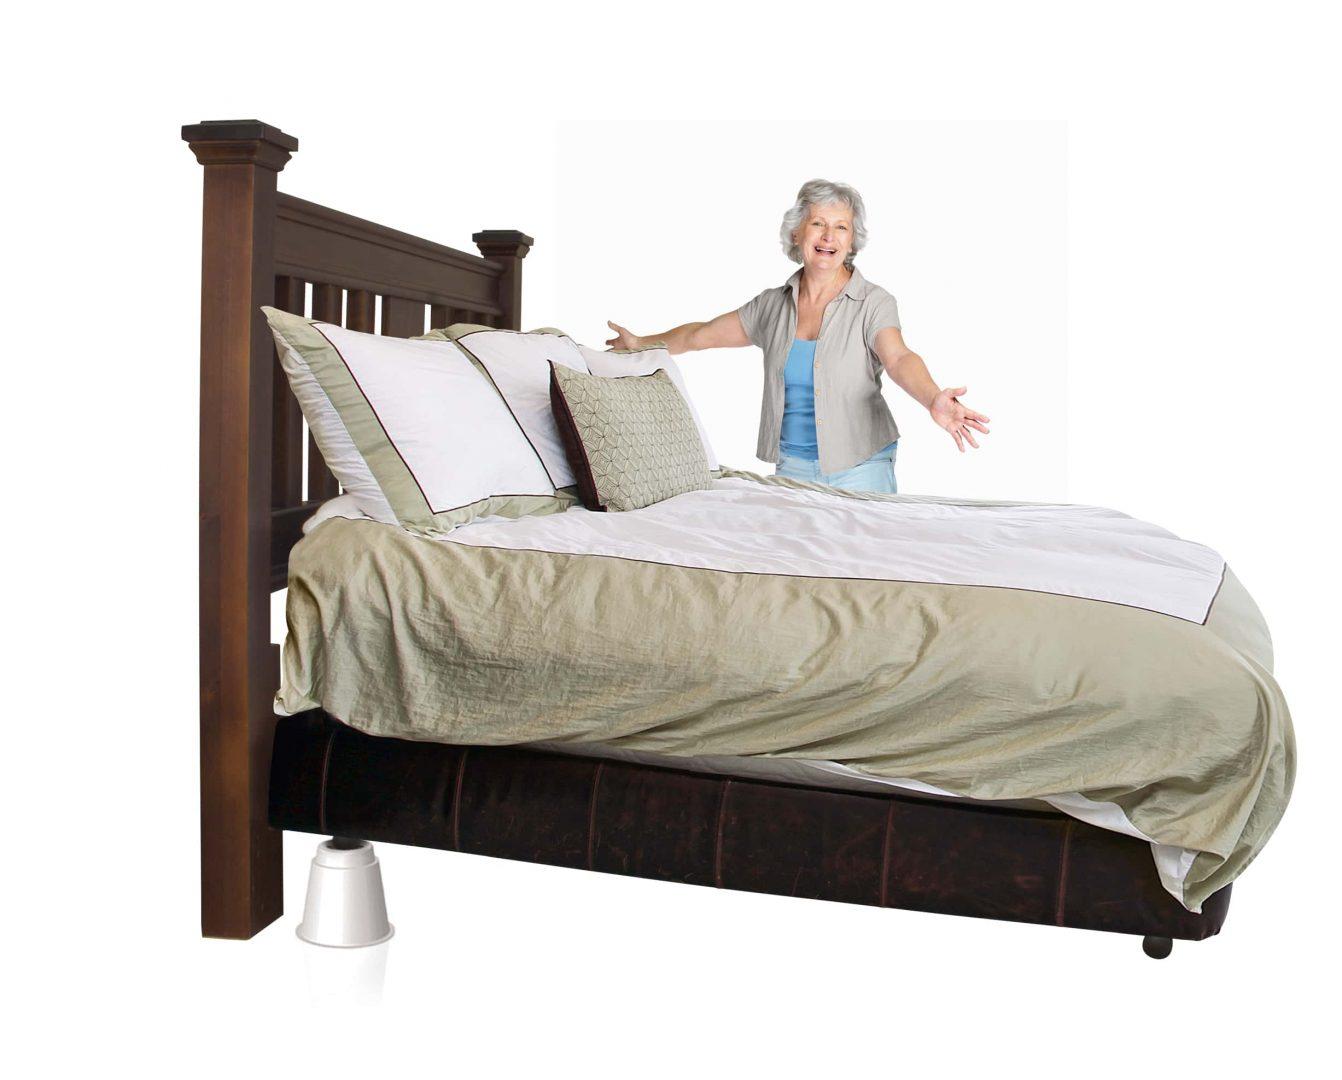 CB656 Medical Bed Risers Riser Raisers